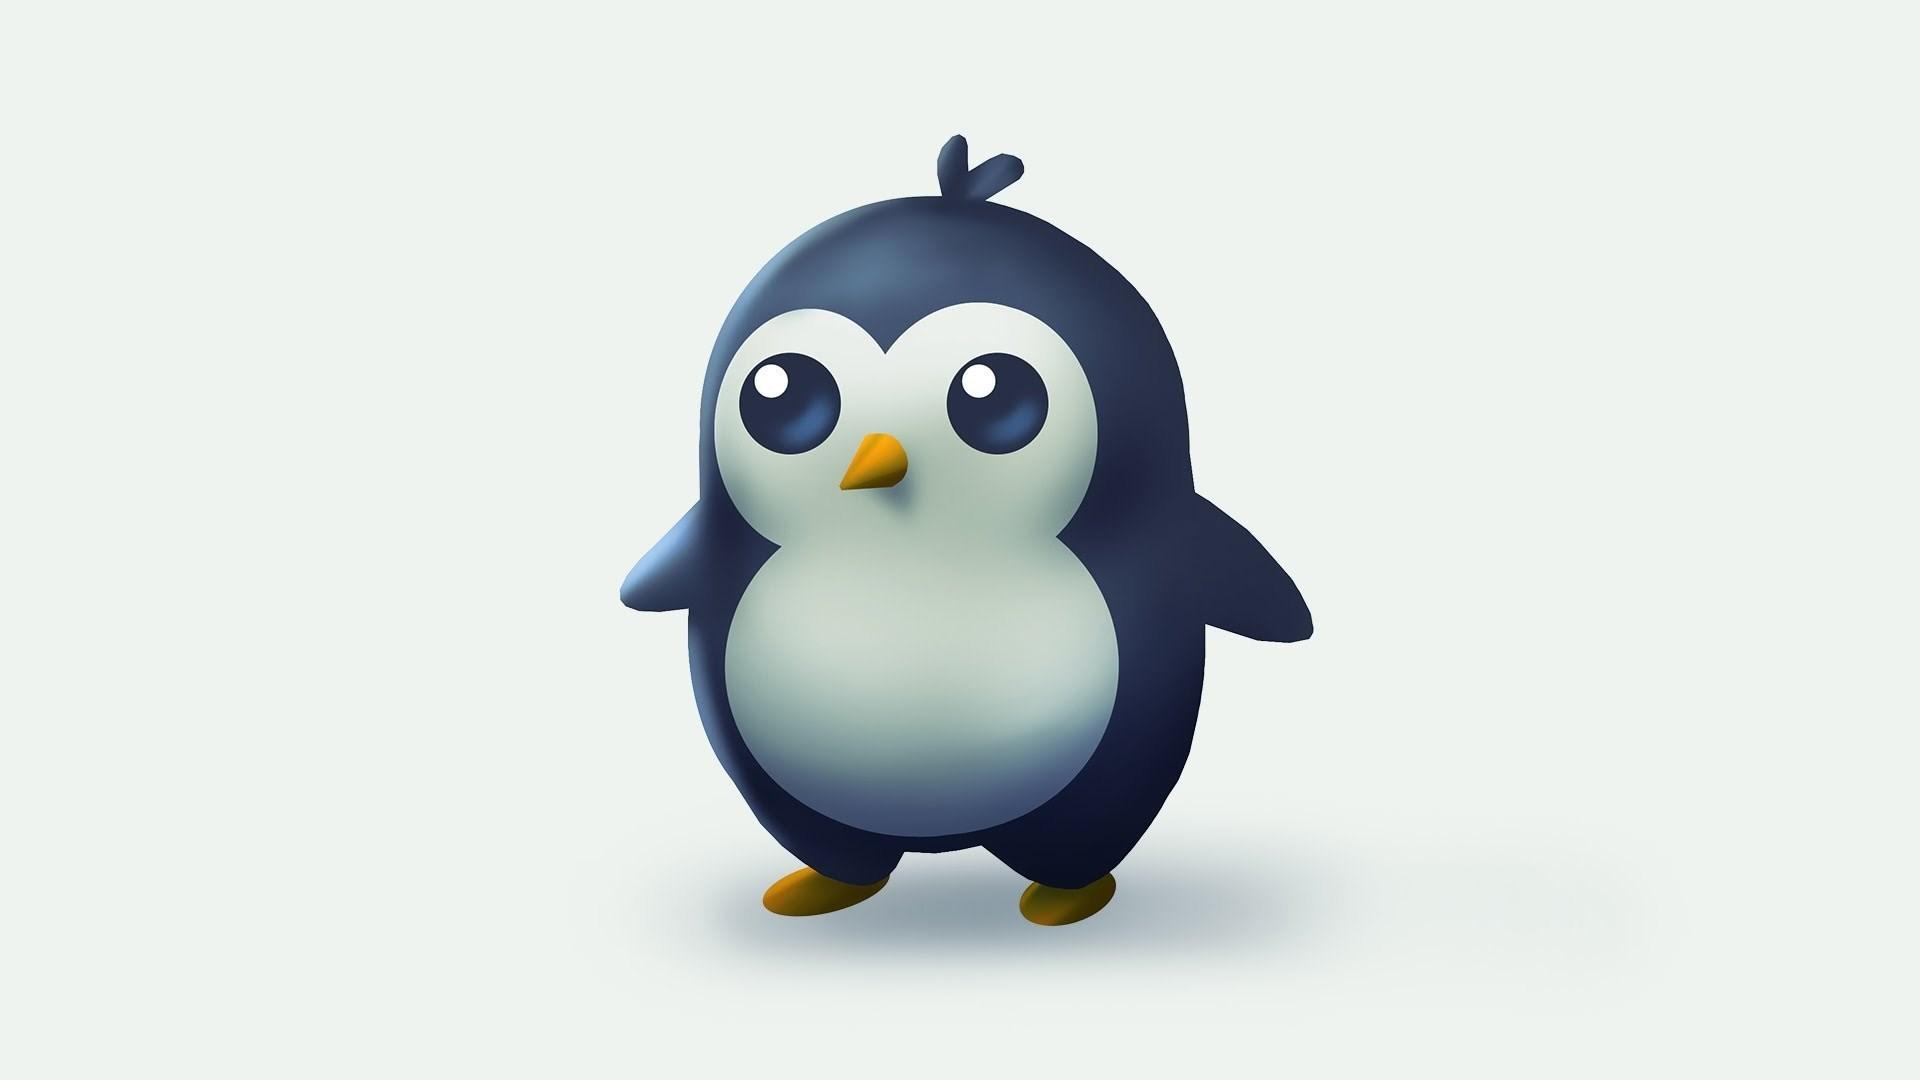 Cute Cartoon Penguins Wallpaper Penguin Hd Wallpapers Pixelstalk Net